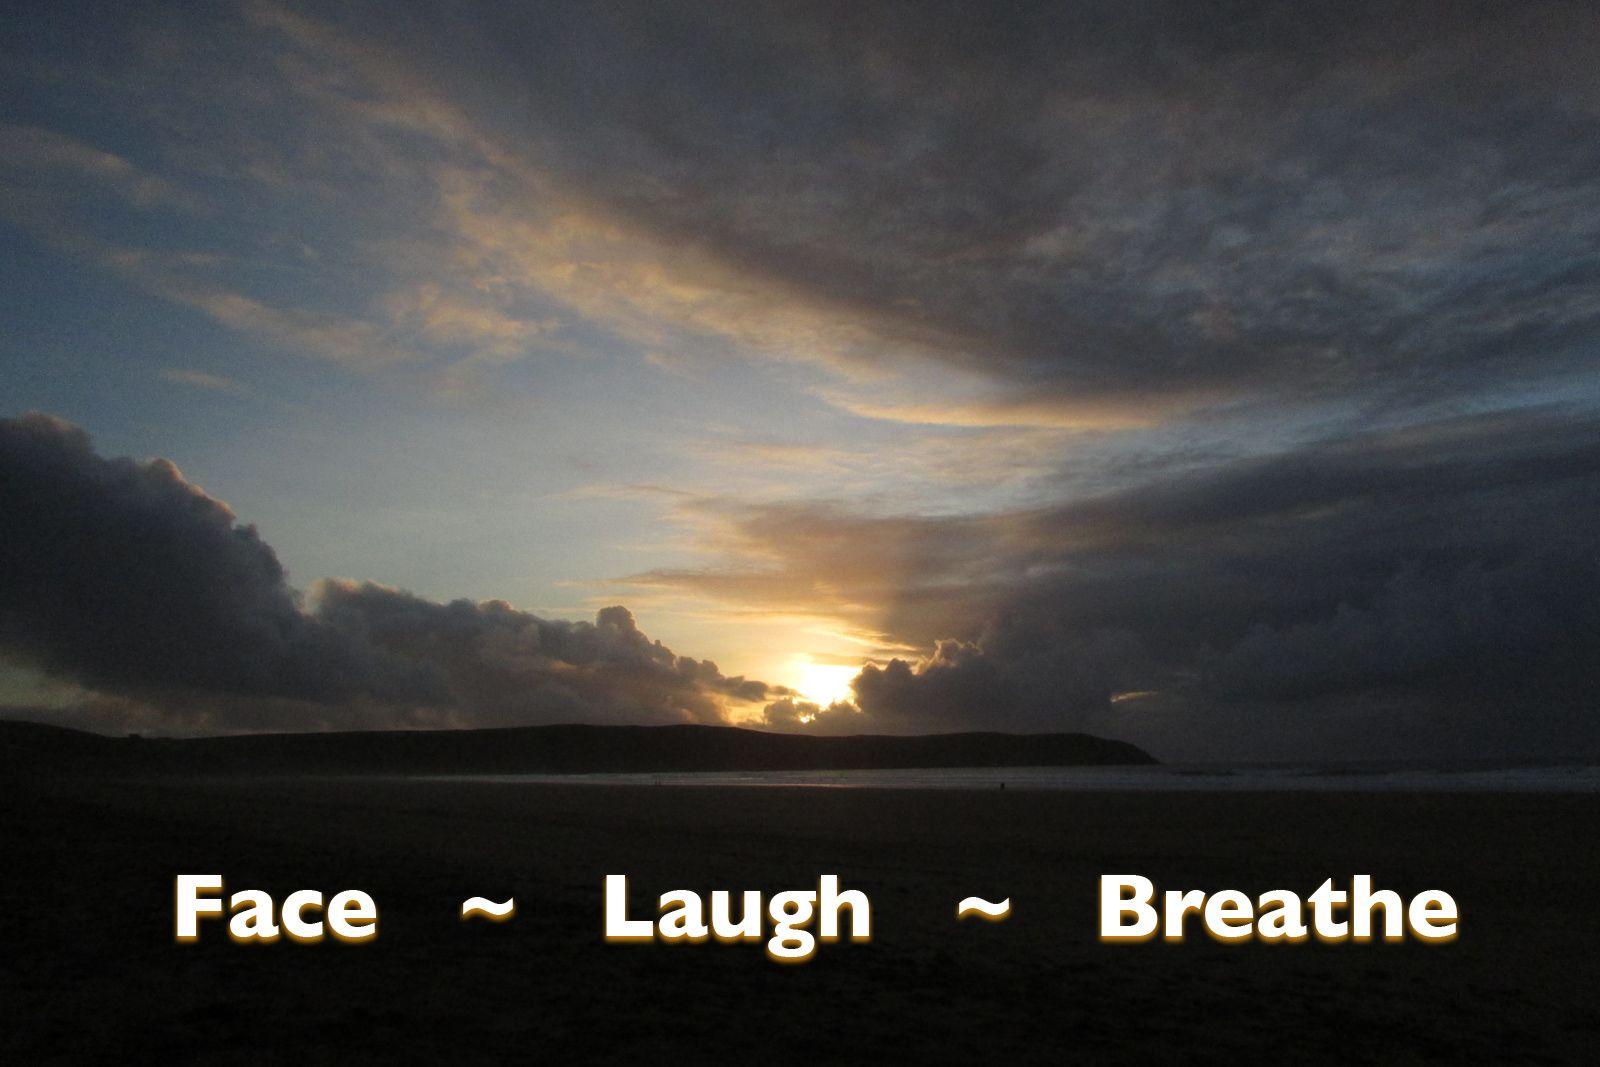 Face ~ Laugh ~ Breathe